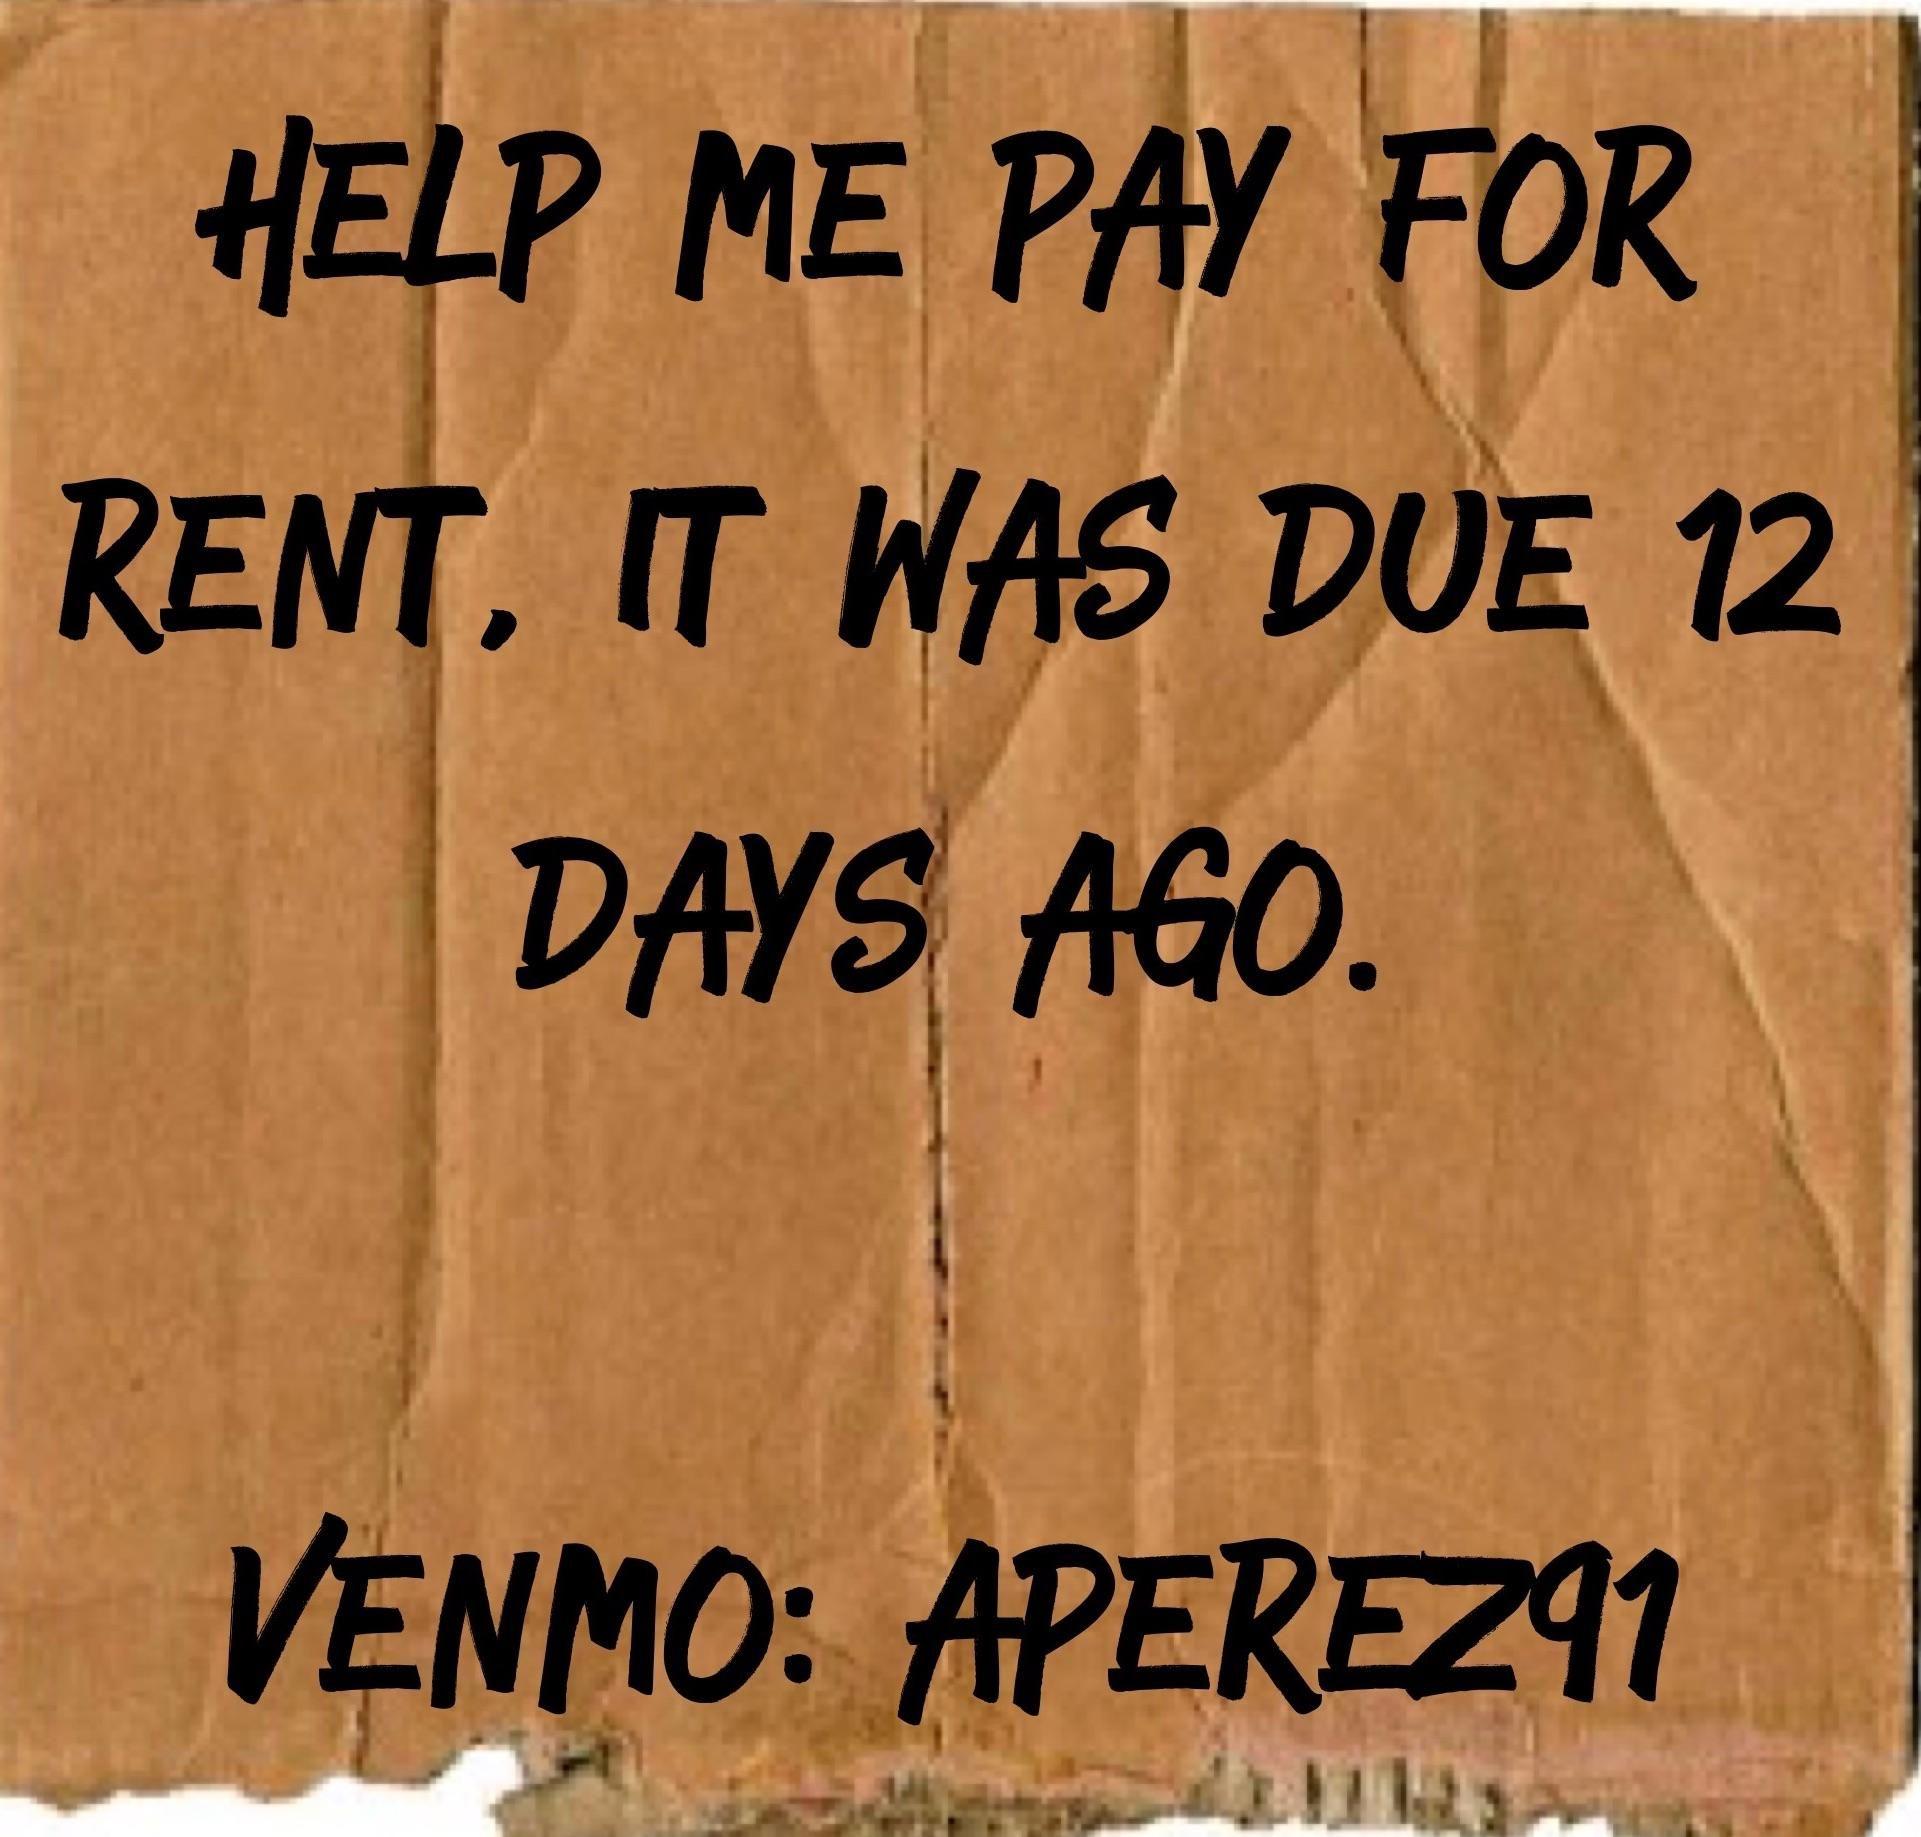 Ux Freelance Needs Rent Help Http Ift Tt 2jgsy6h Funny Texts Funny Gif Funny Jokes